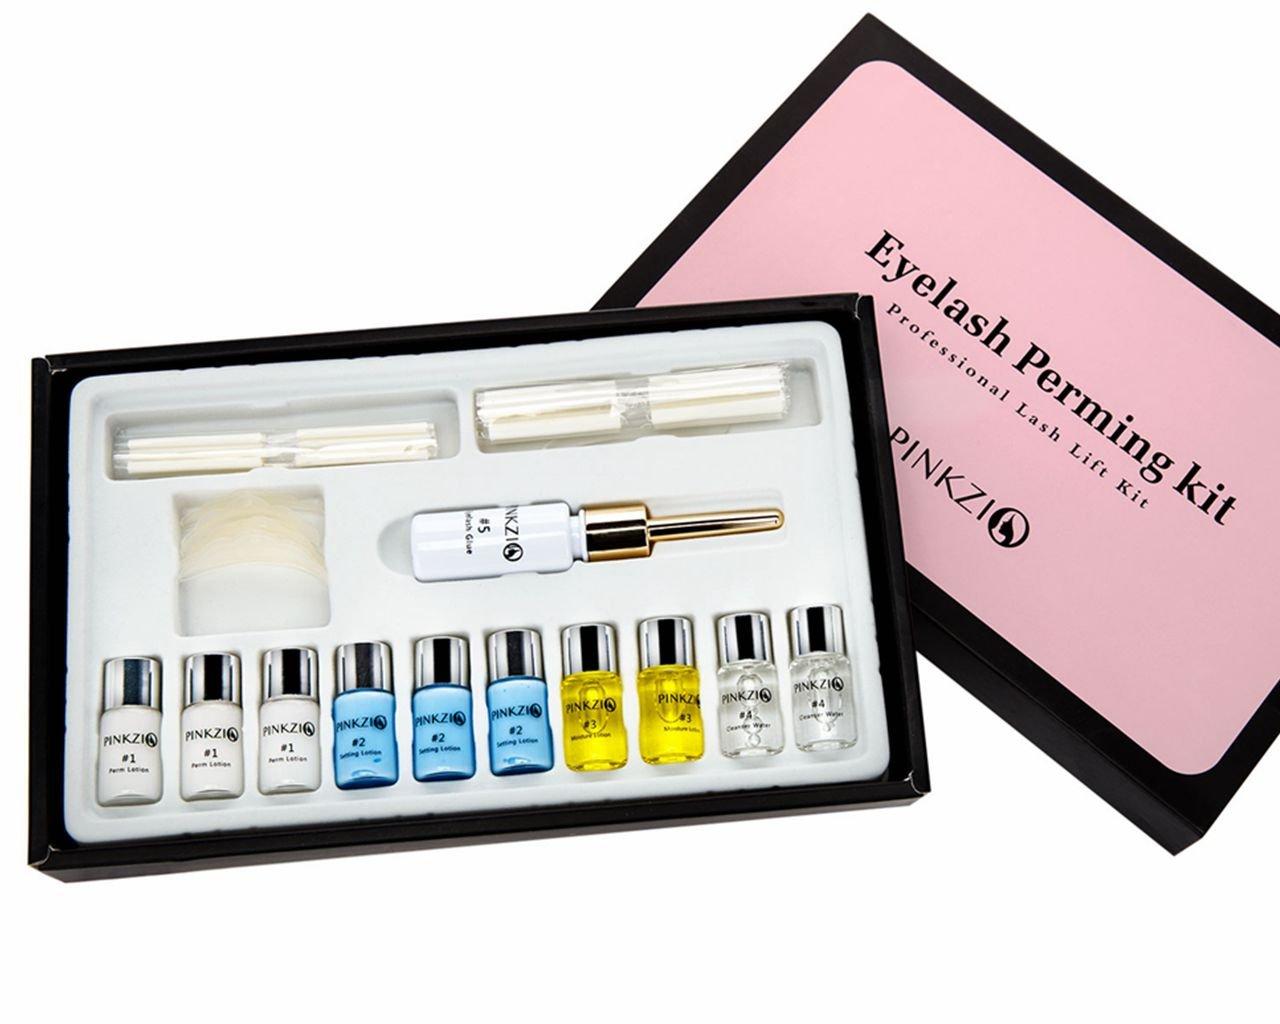 Pinkzio Premium Eyelash Perm Kit Full Eyelash Lift Kit For Professional Use, 15 in 1 Salon Lashlift Eyelash Perming kit